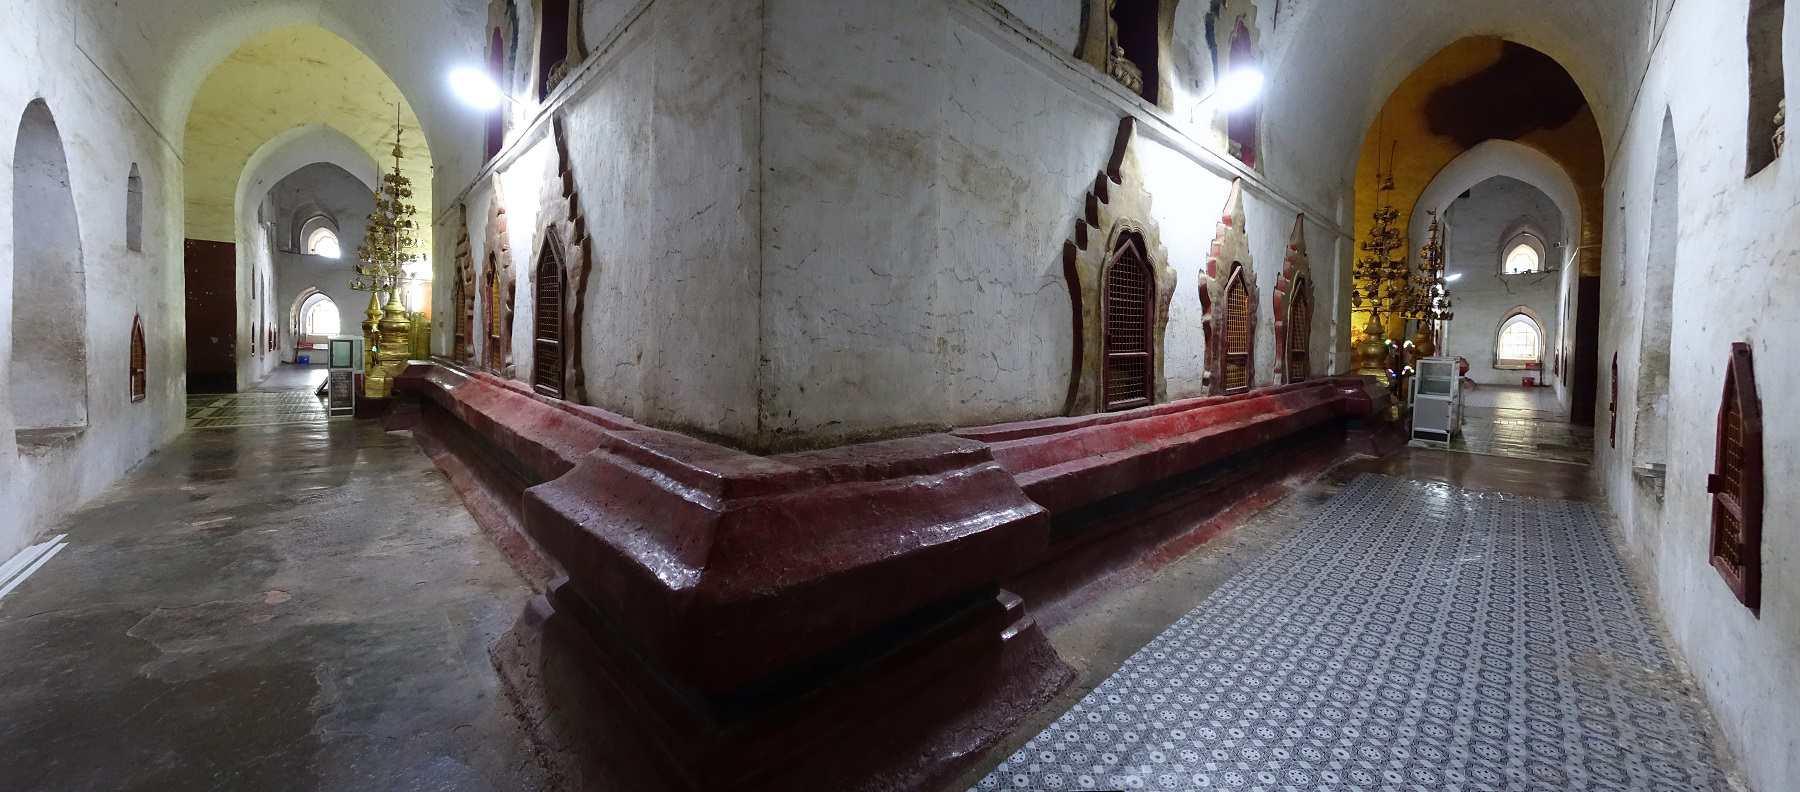 Hallway inside Ananda Temple, Bagan, Myanmar